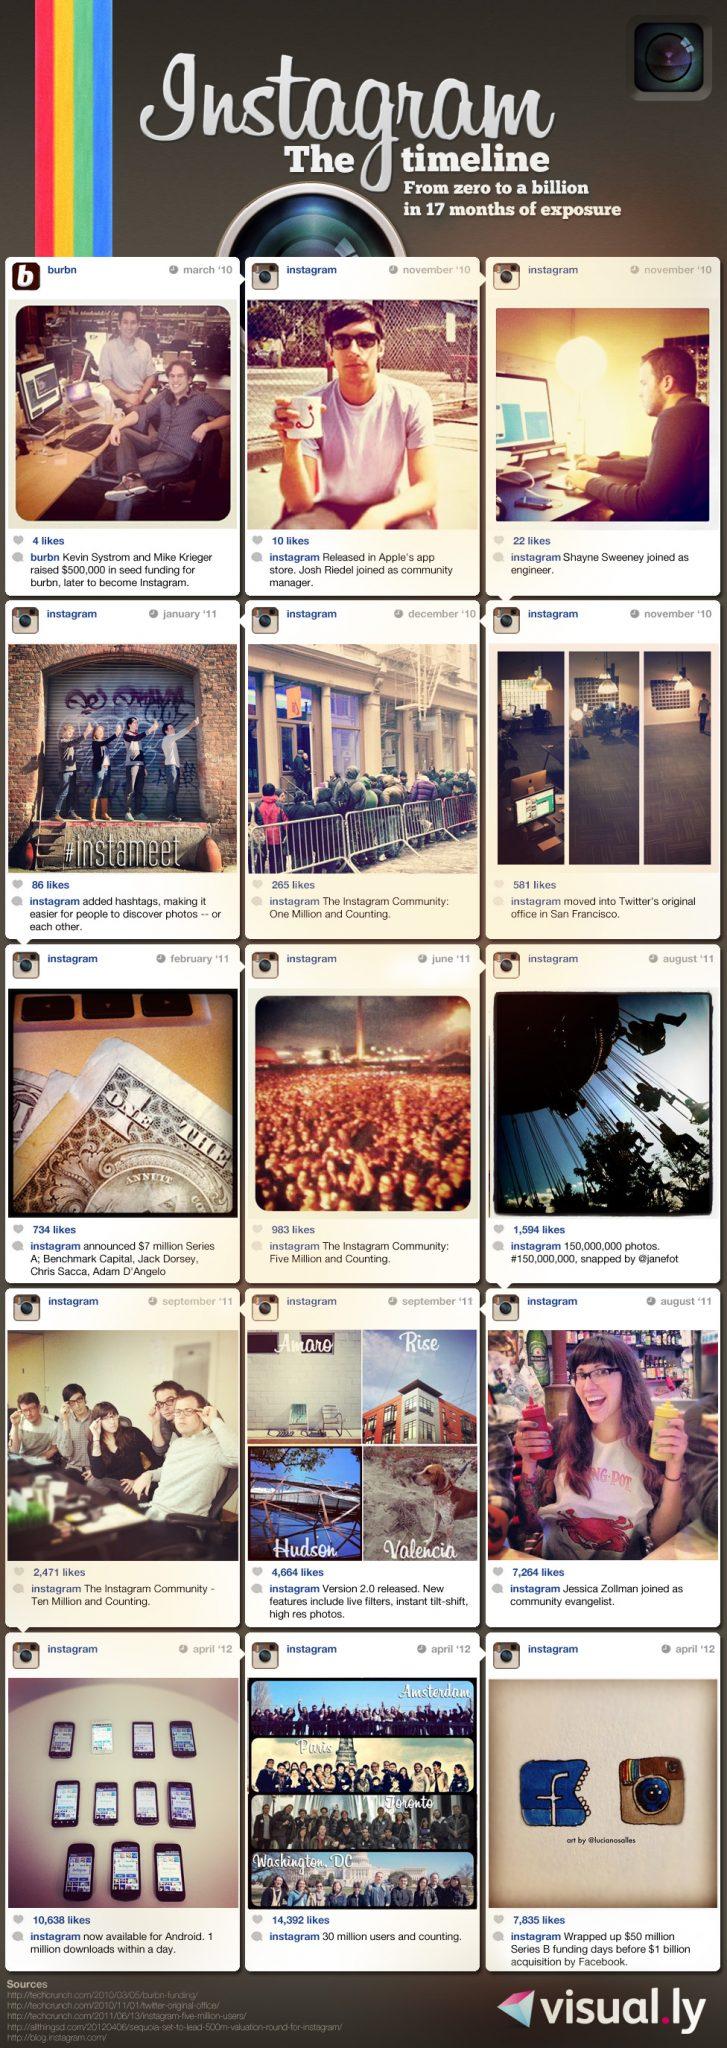 Instagram From Zeroto a one Billion